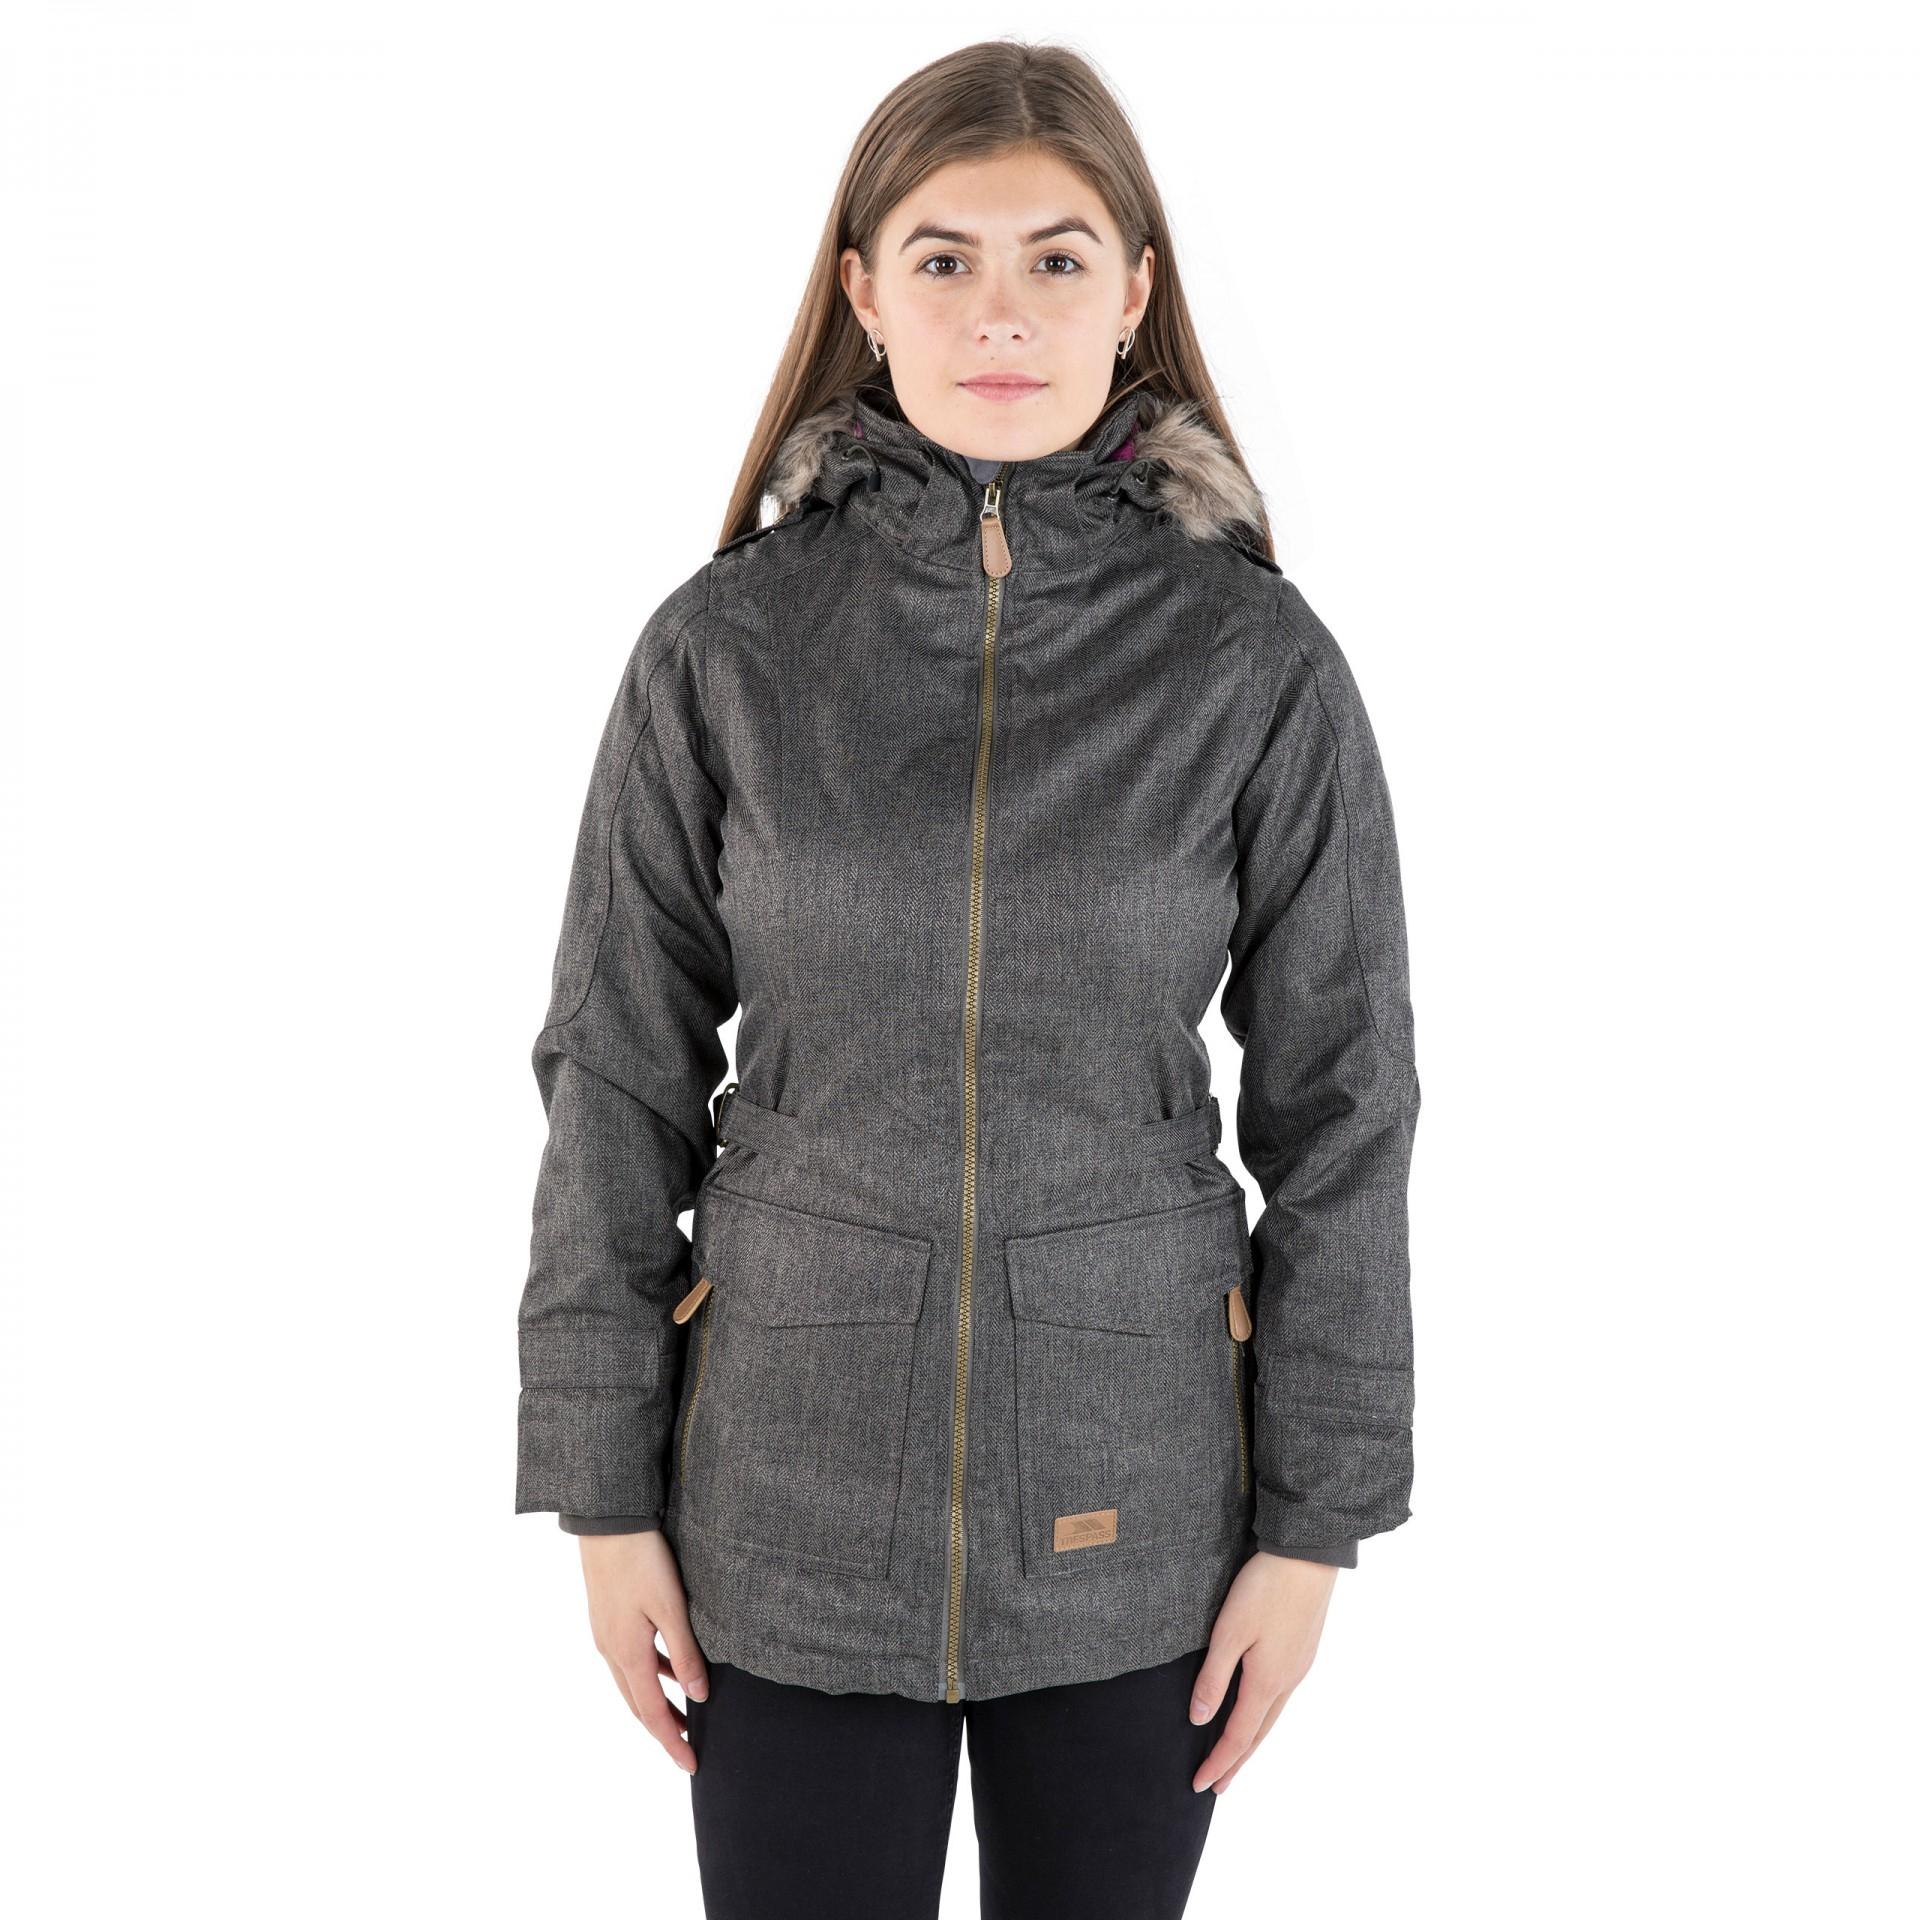 Trespass Everyday Women's Padded Waterproof Jacket marked up £0.00 - free c&c / £2.95 del